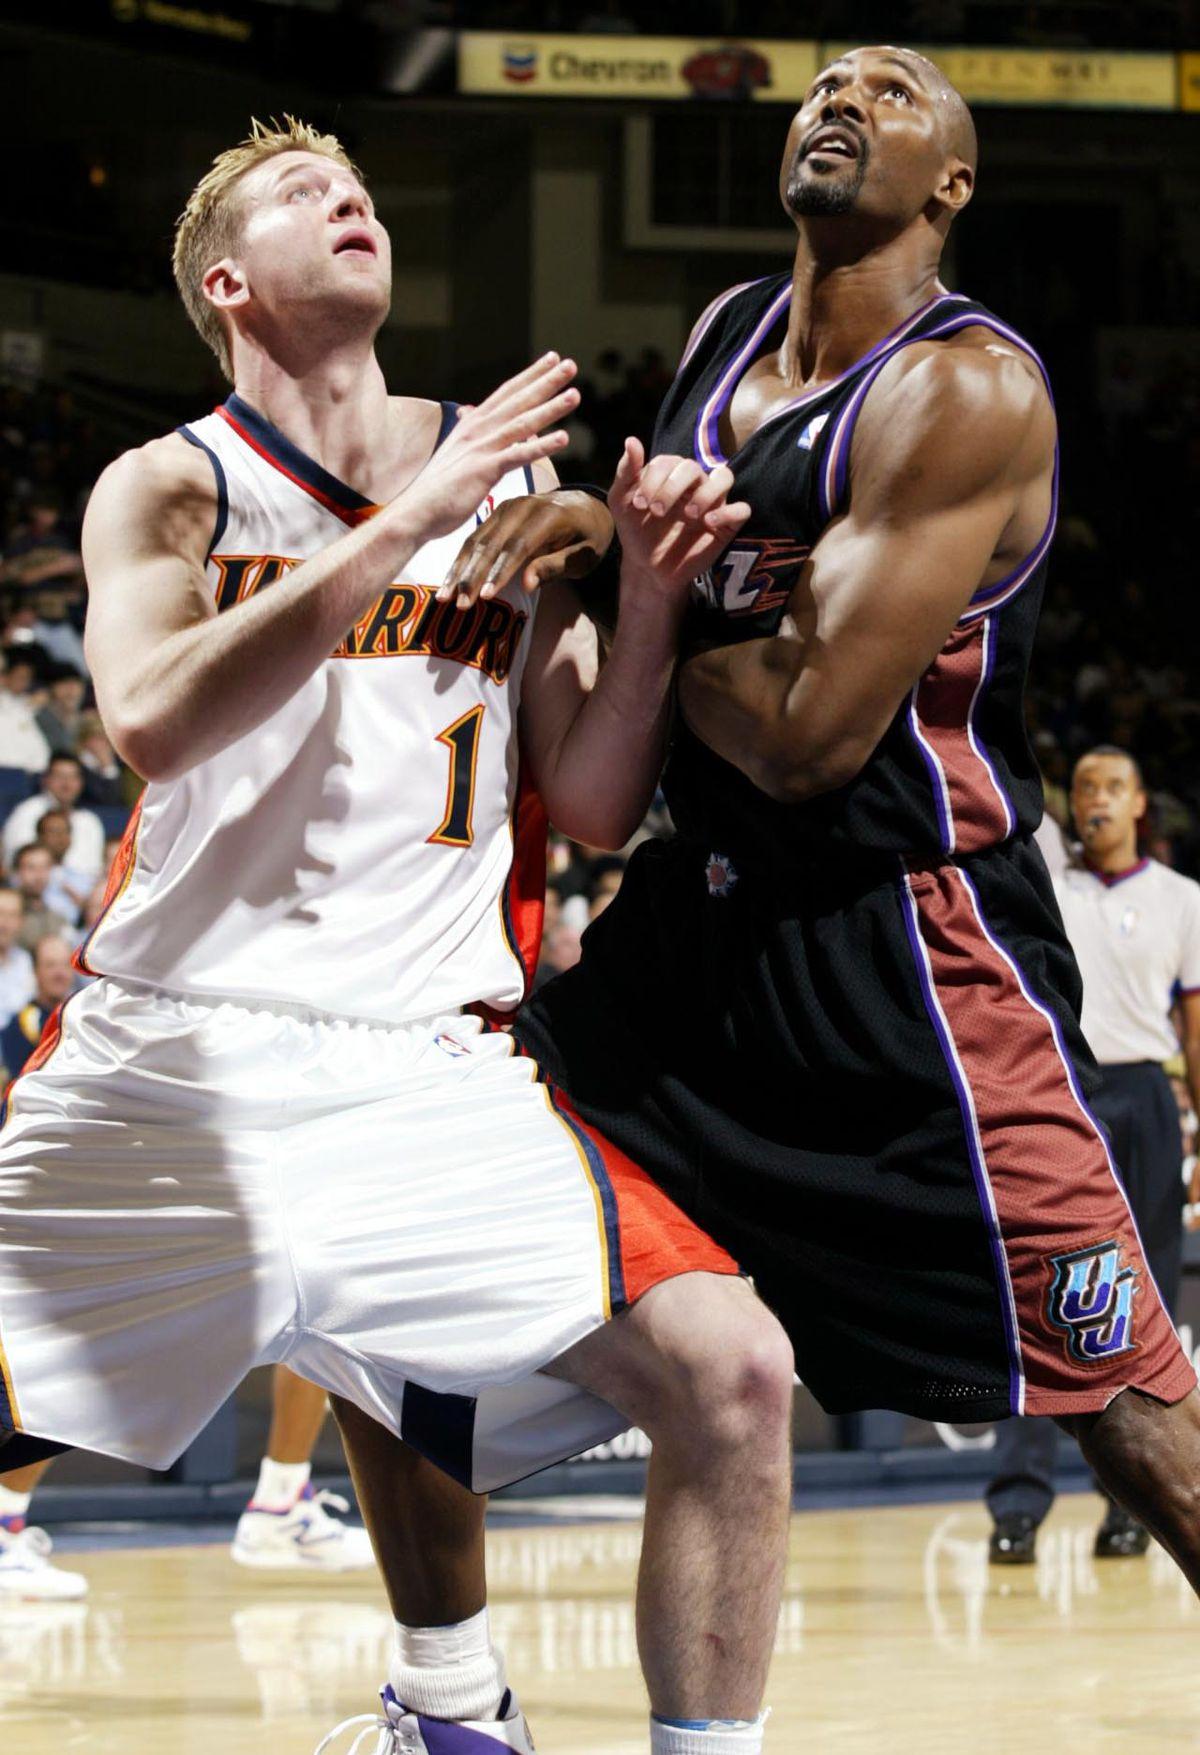 Malone rebounds